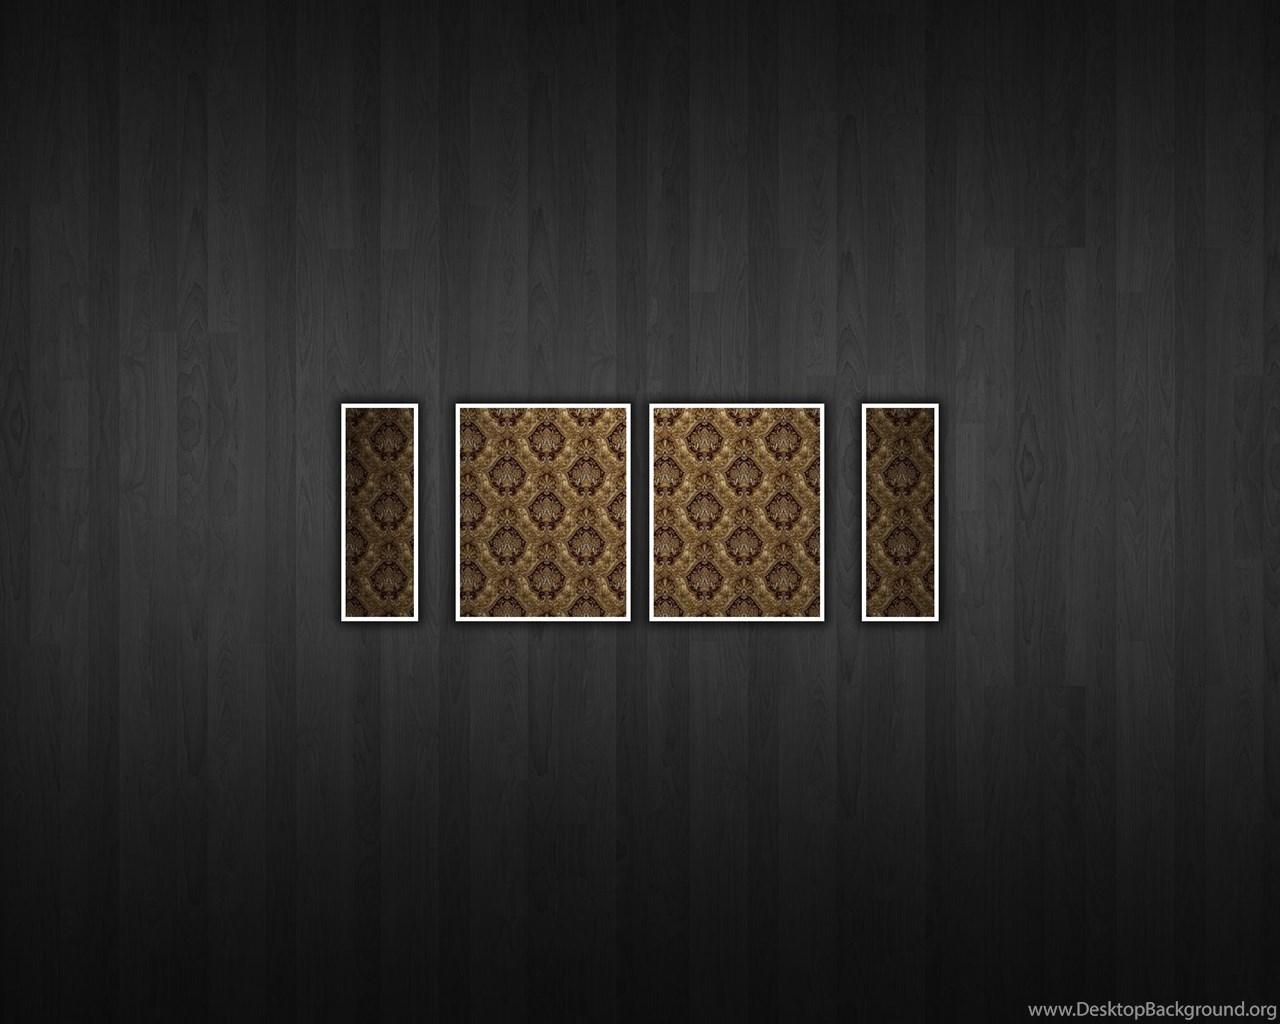 Download The Persian Rug Wallpaper Persian Rug Iphone Wallpapers Desktop Background